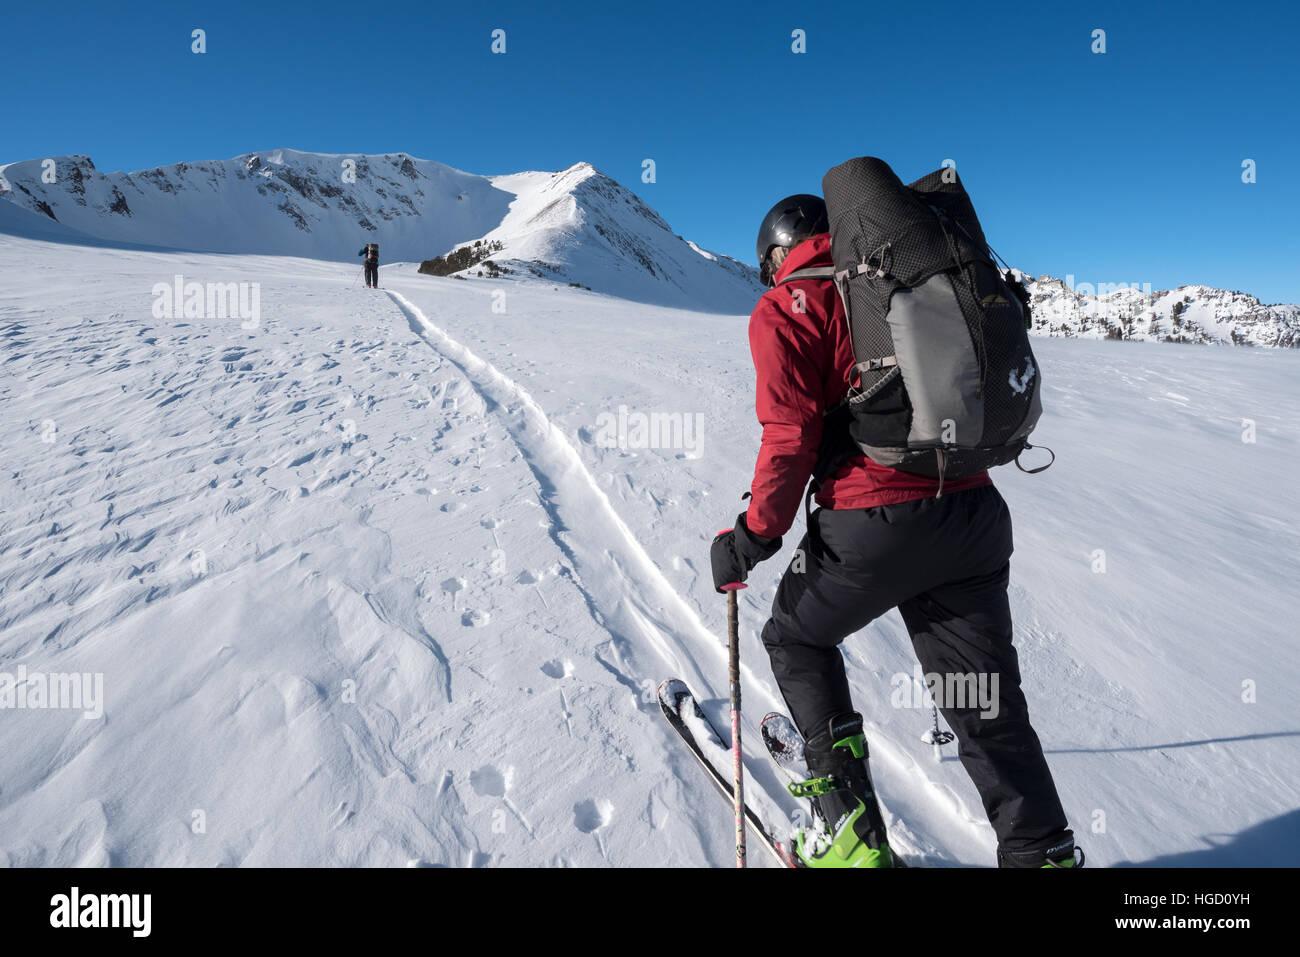 Backcountry skiing in Oregon's Wallowa Mountains. - Stock Image